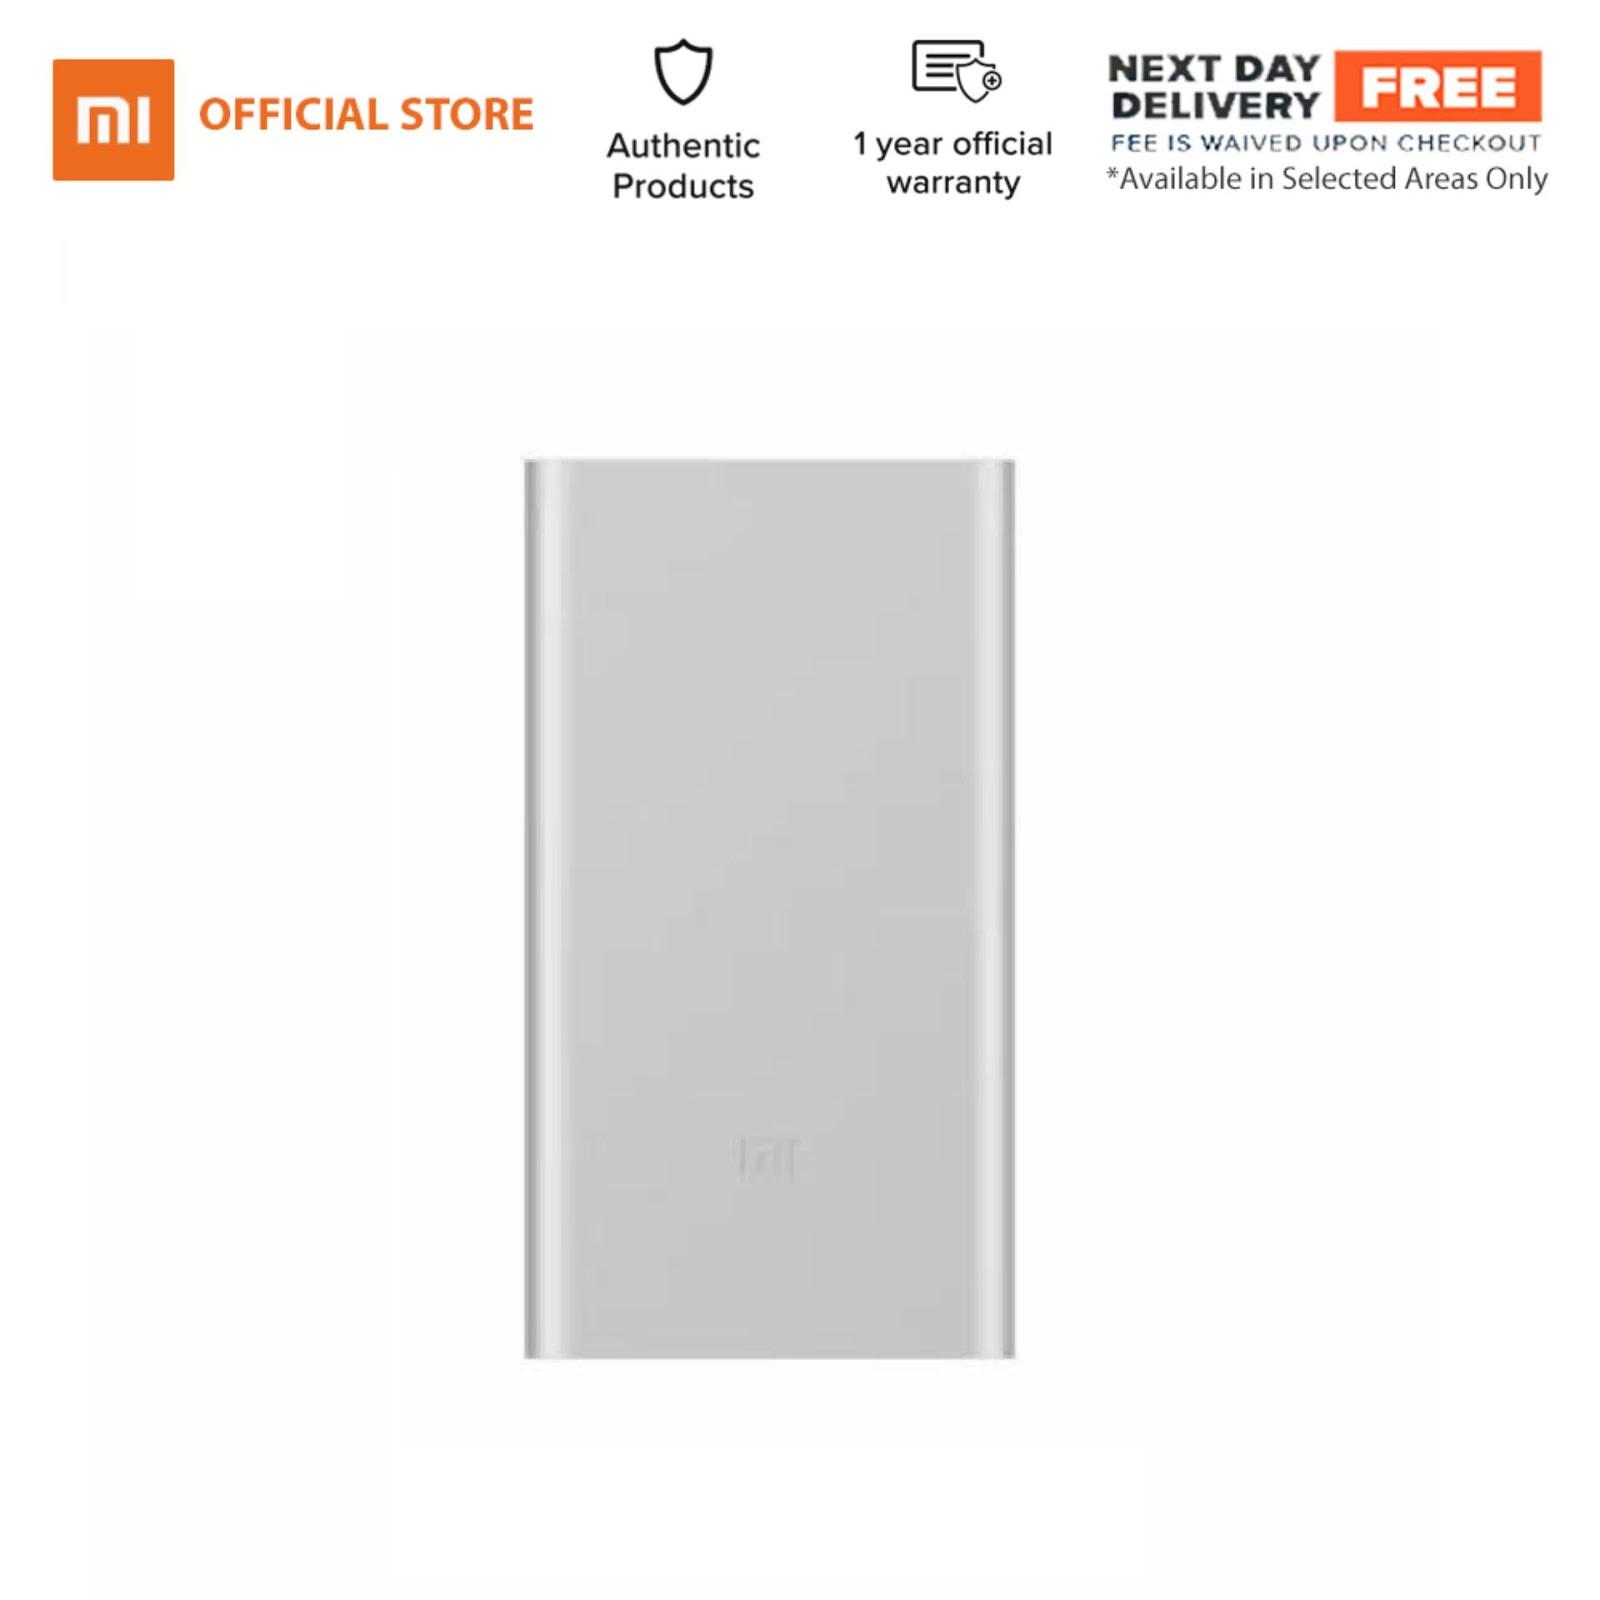 Xiaomi Mi Power Bank 2 10000mah Black Silver 59900 Cod Official Powerbank Now Before 69900 14 Off Https Googl 4iznjy B5yce2